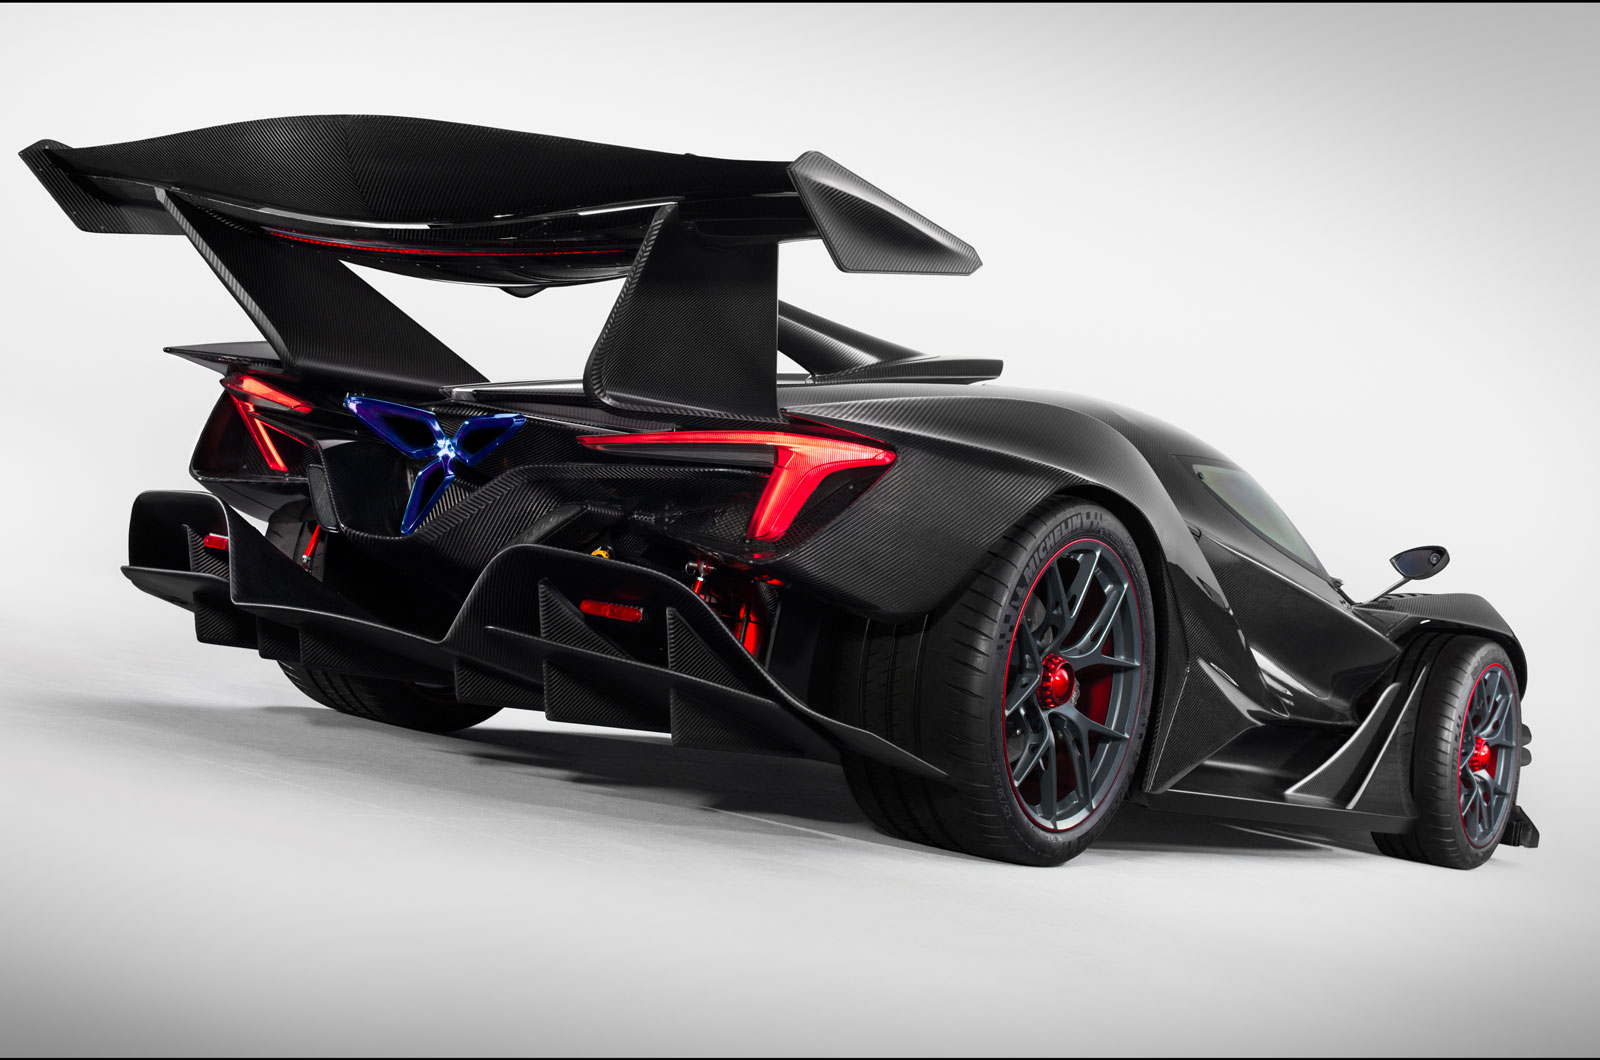 Mclaren P1 Cost >> £2m Apollo Intensa Emozione track hypercar revealed with 769bhp | Autocar